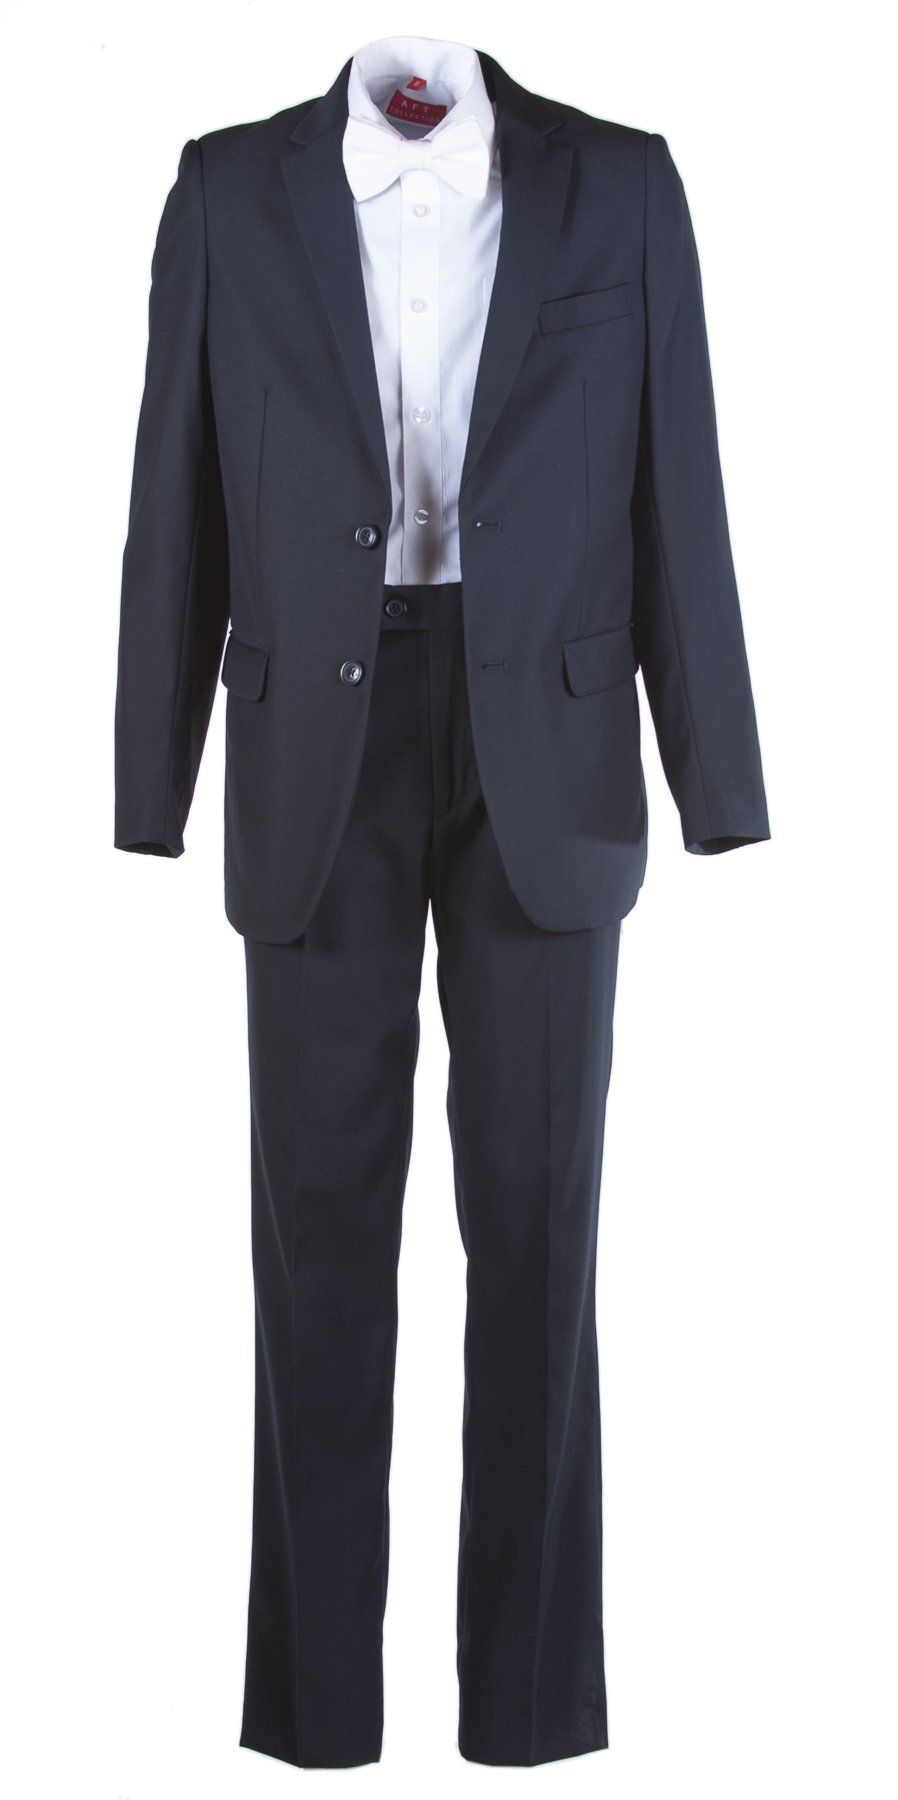 Boys Slim Fit Navy Communion Suit Suspenders & White Paisley Bow Tie (8 Boys)